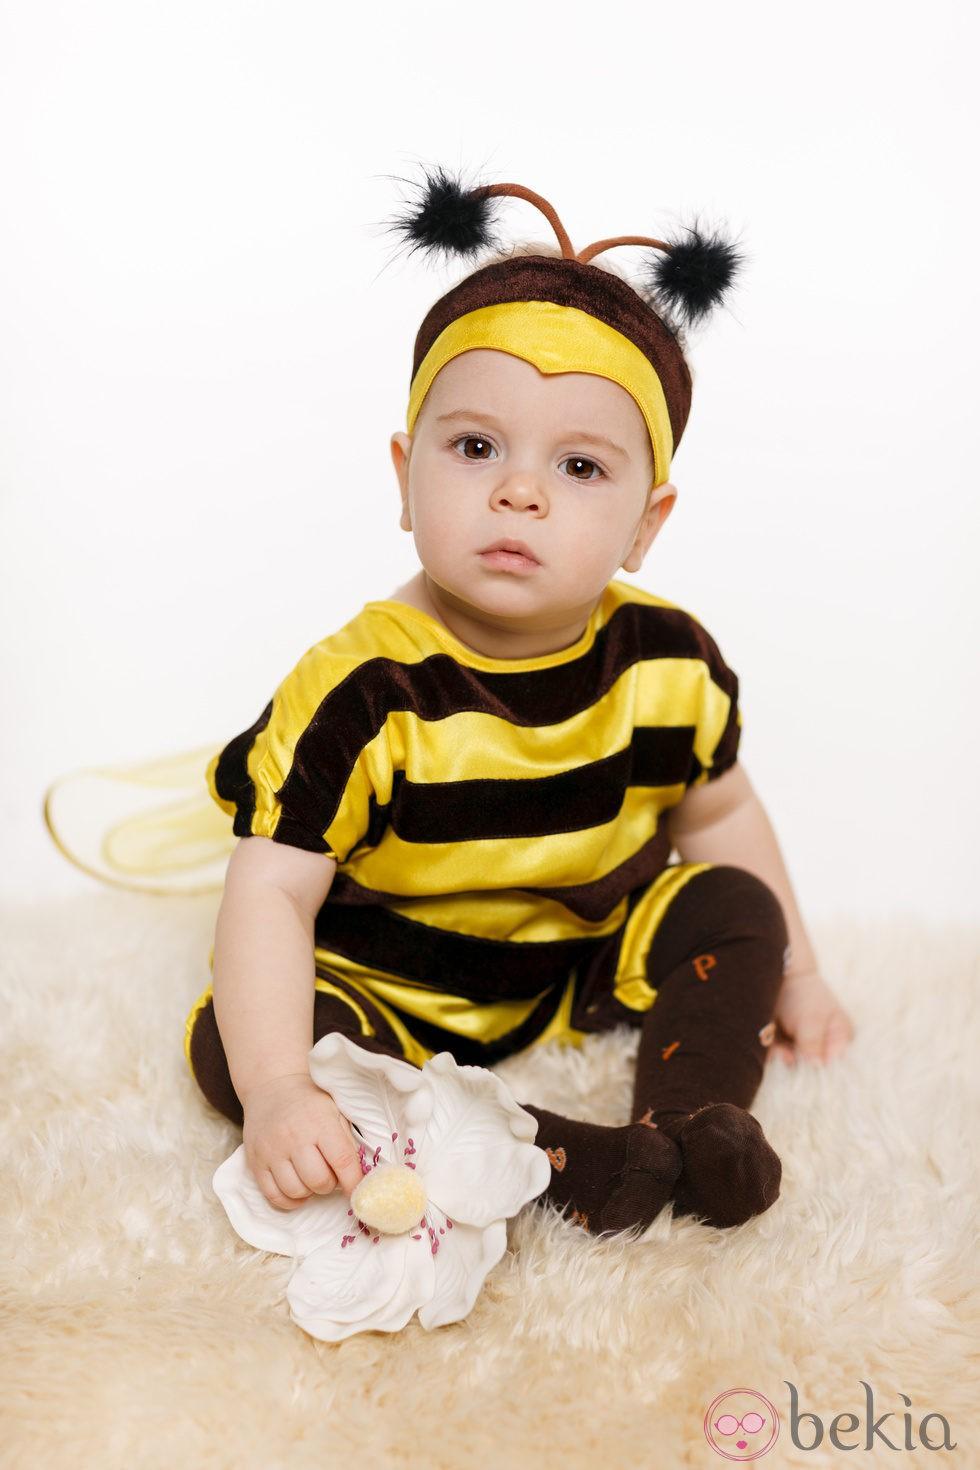 Disfraz de abeja para beb disfraces de ni os para halloween en bekia padres - Disfraces de halloween bebes ...